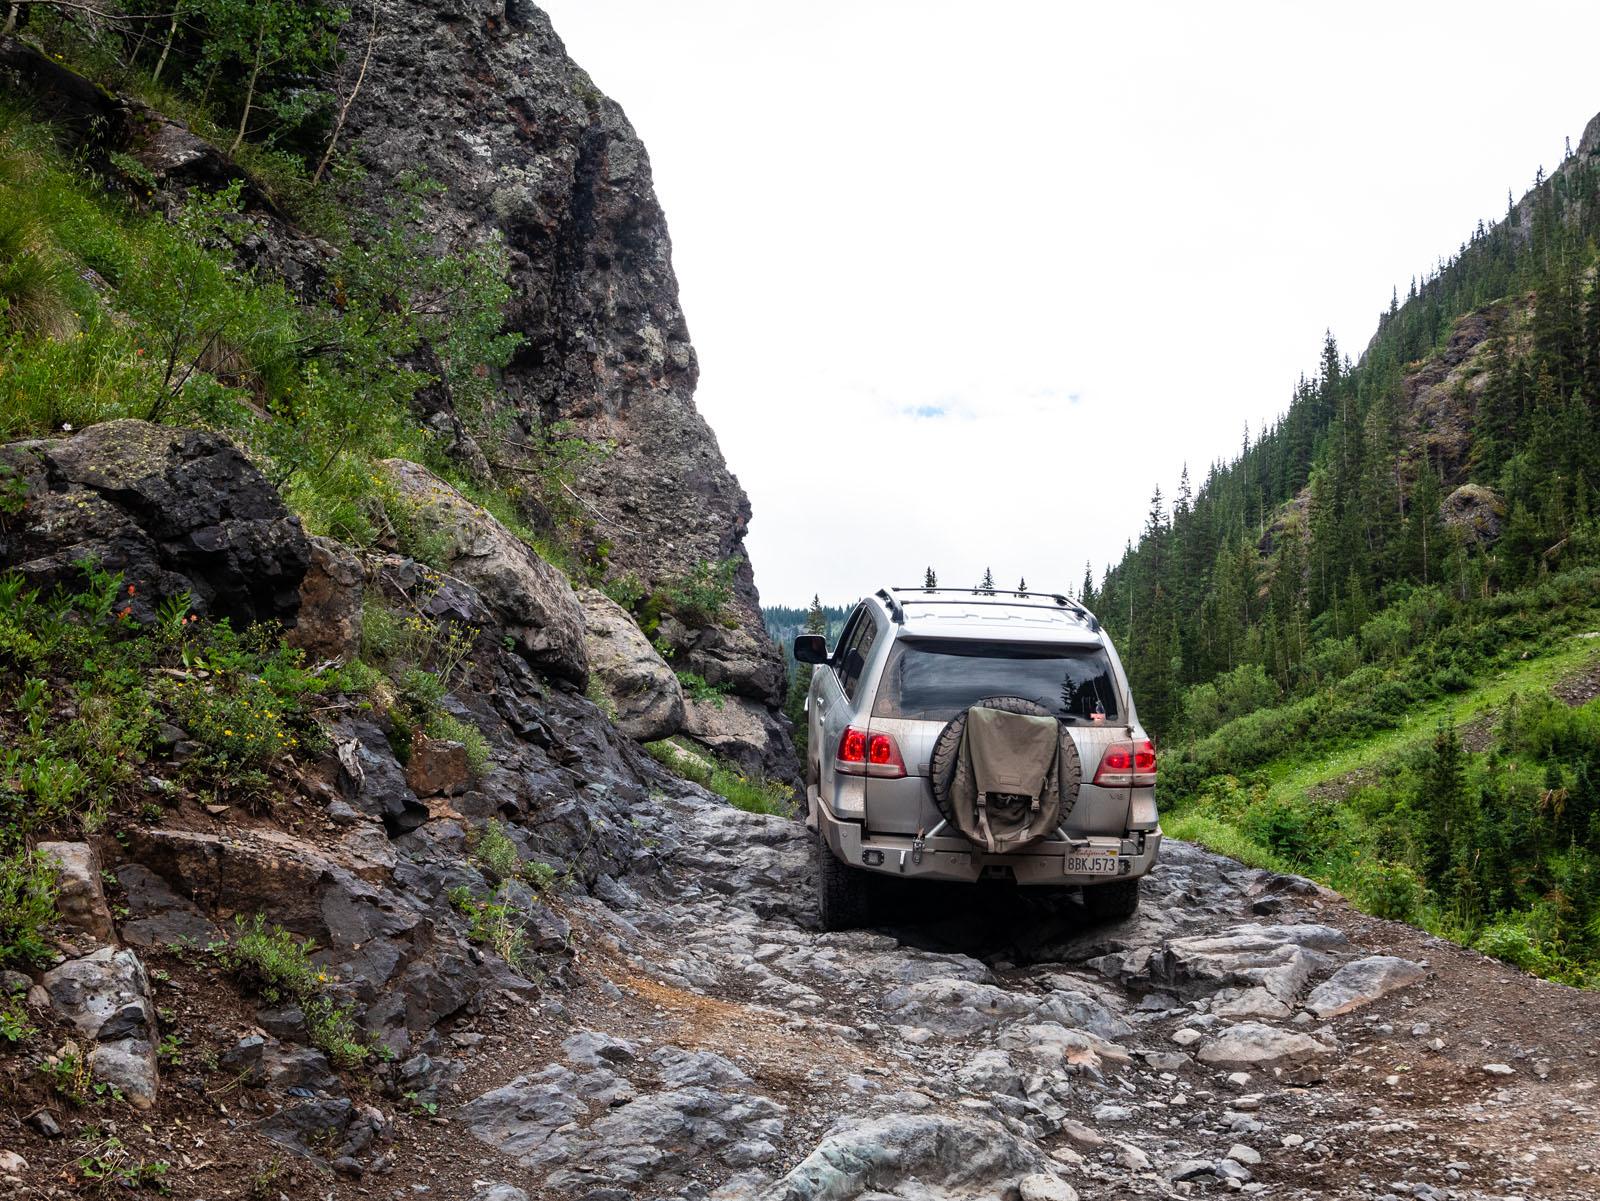 CO_Vacationmoon_200LCDC_Trucks-1000865.jpg